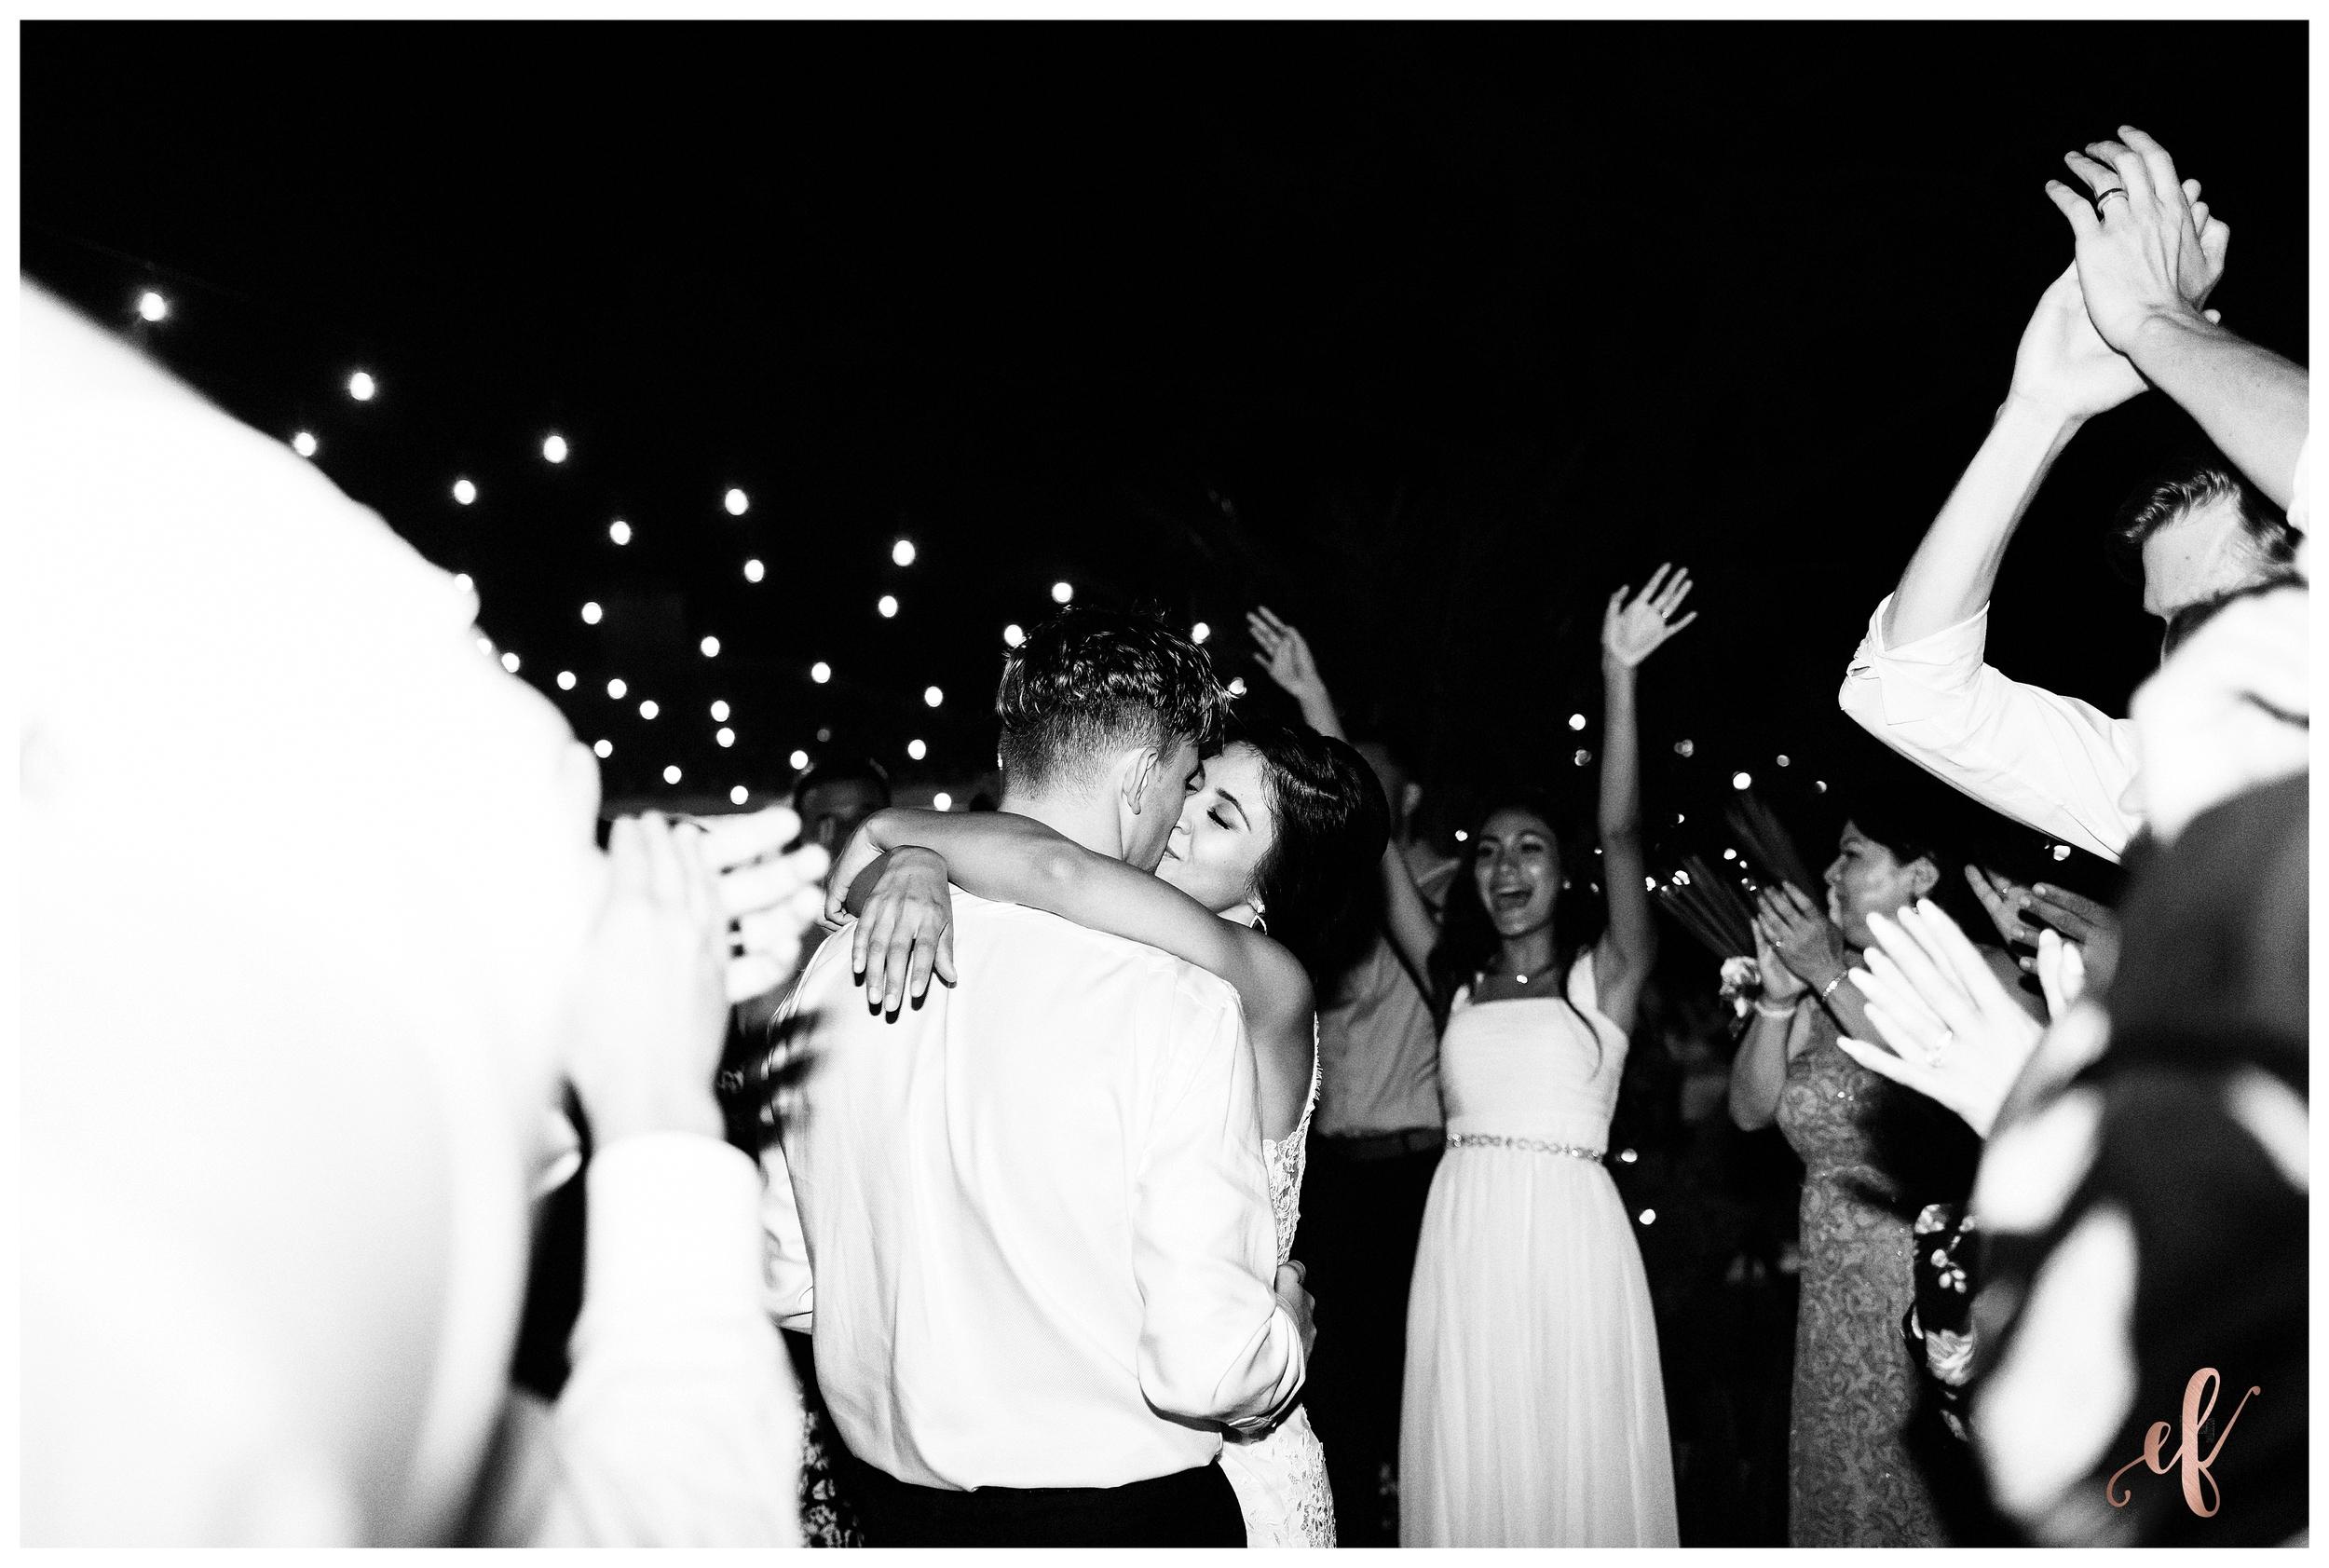 San Diego Wedding Photographer   Ernie & Fiona Photography   Bride   Groom   Dance